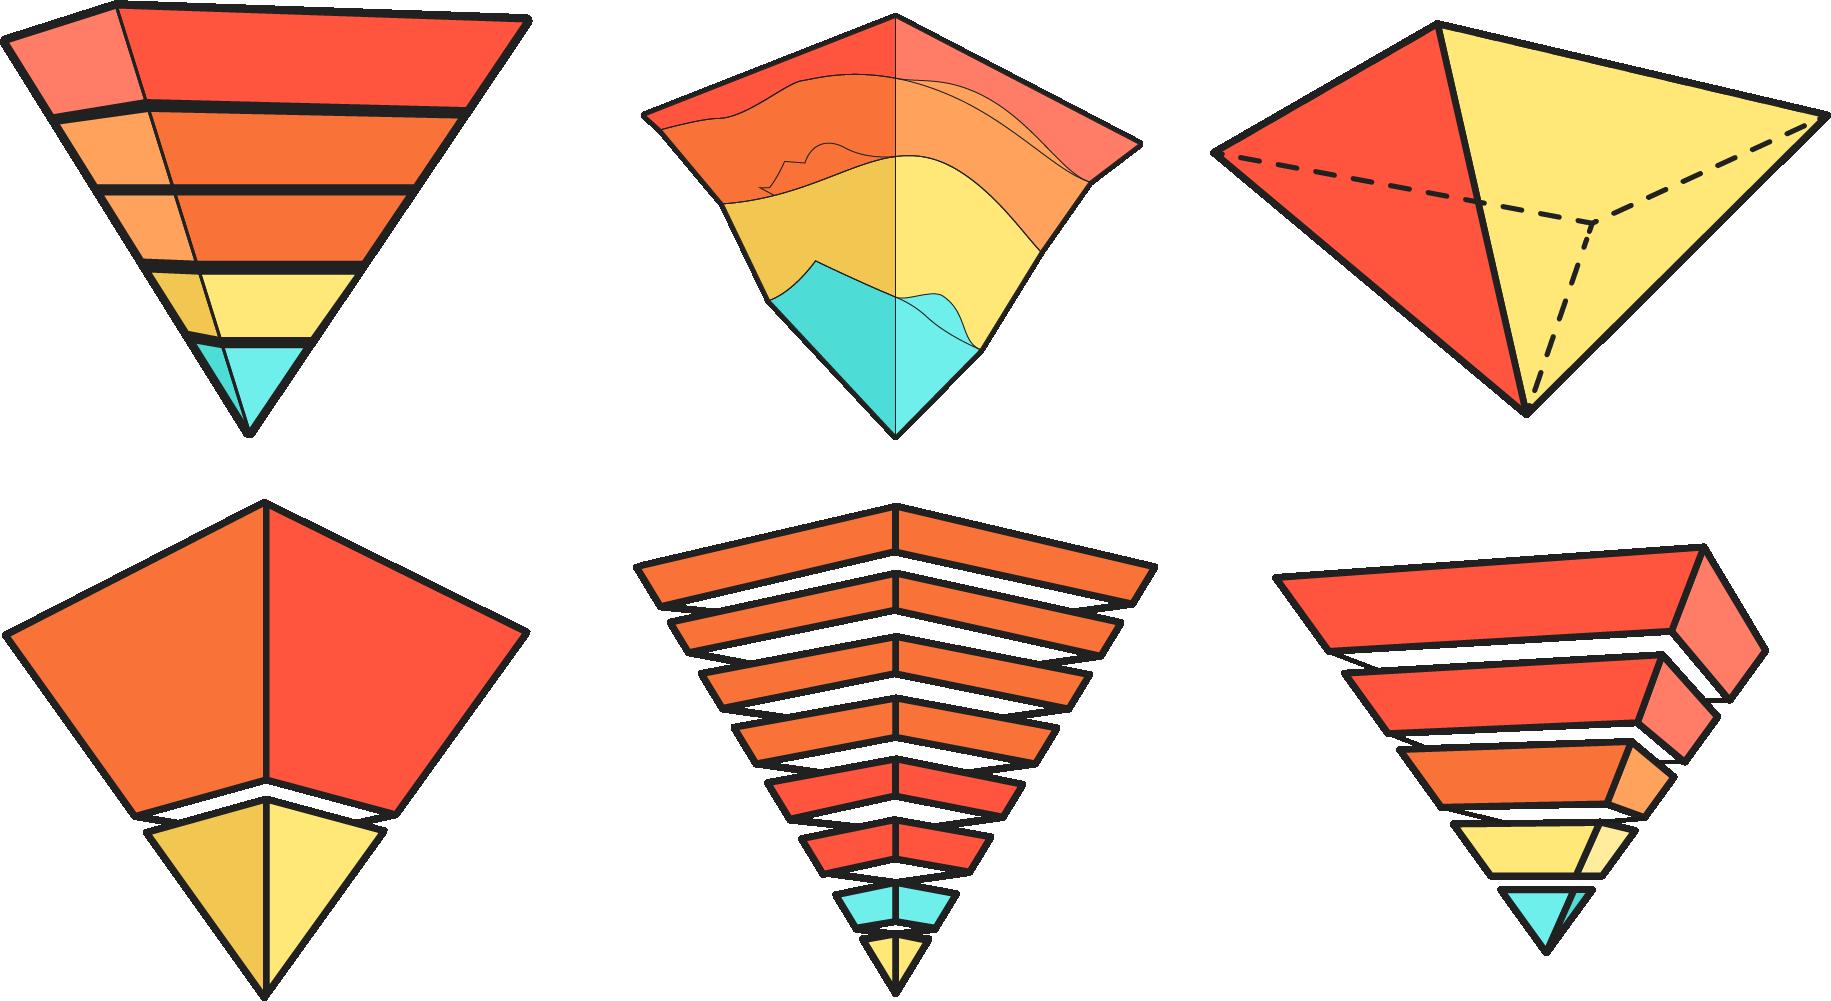 Inverted rainbow. Egypt clipart triangle pyramid